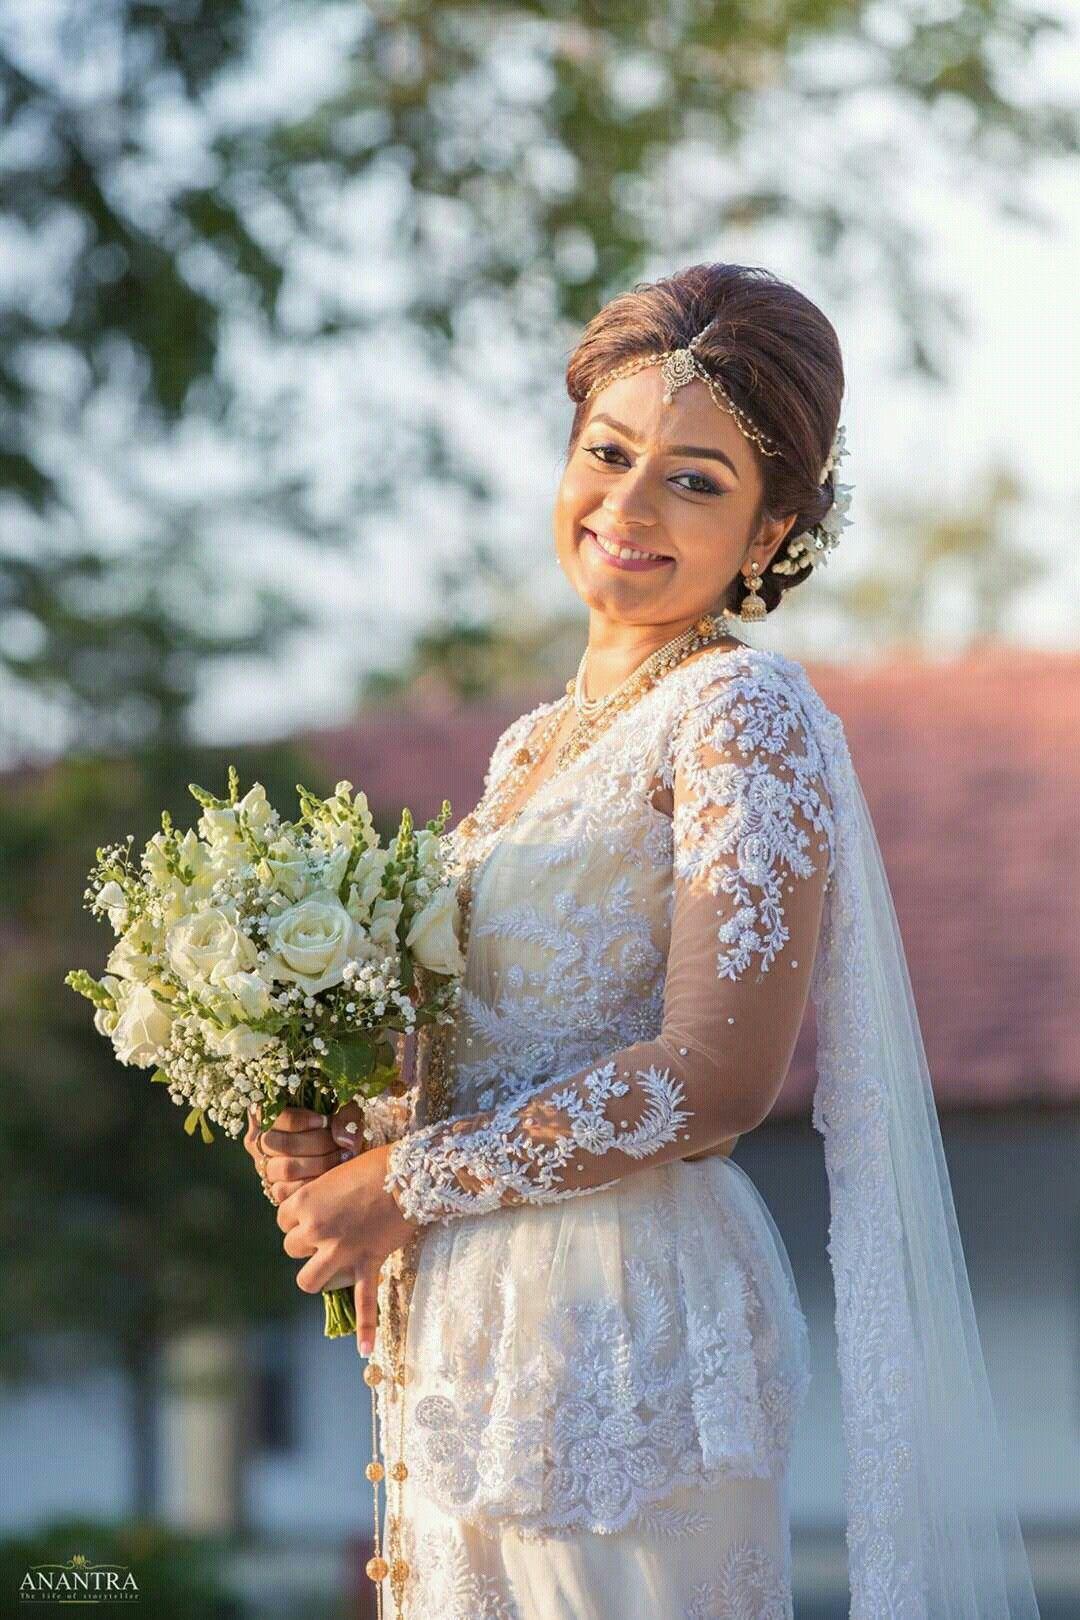 pin by yashodara rathnathilaka on kandian brides | pinterest